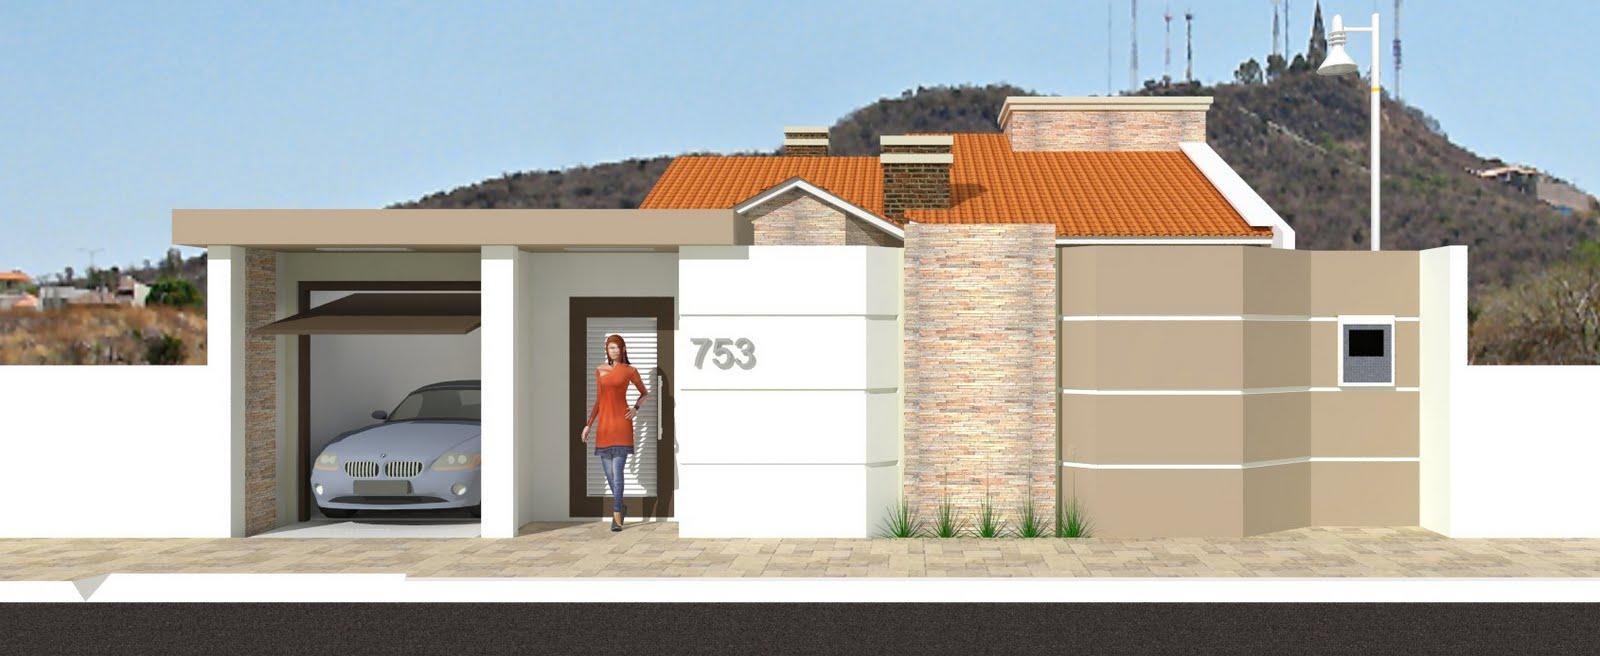 Modelos de muros simples decorando casas - Tipos de muros ...